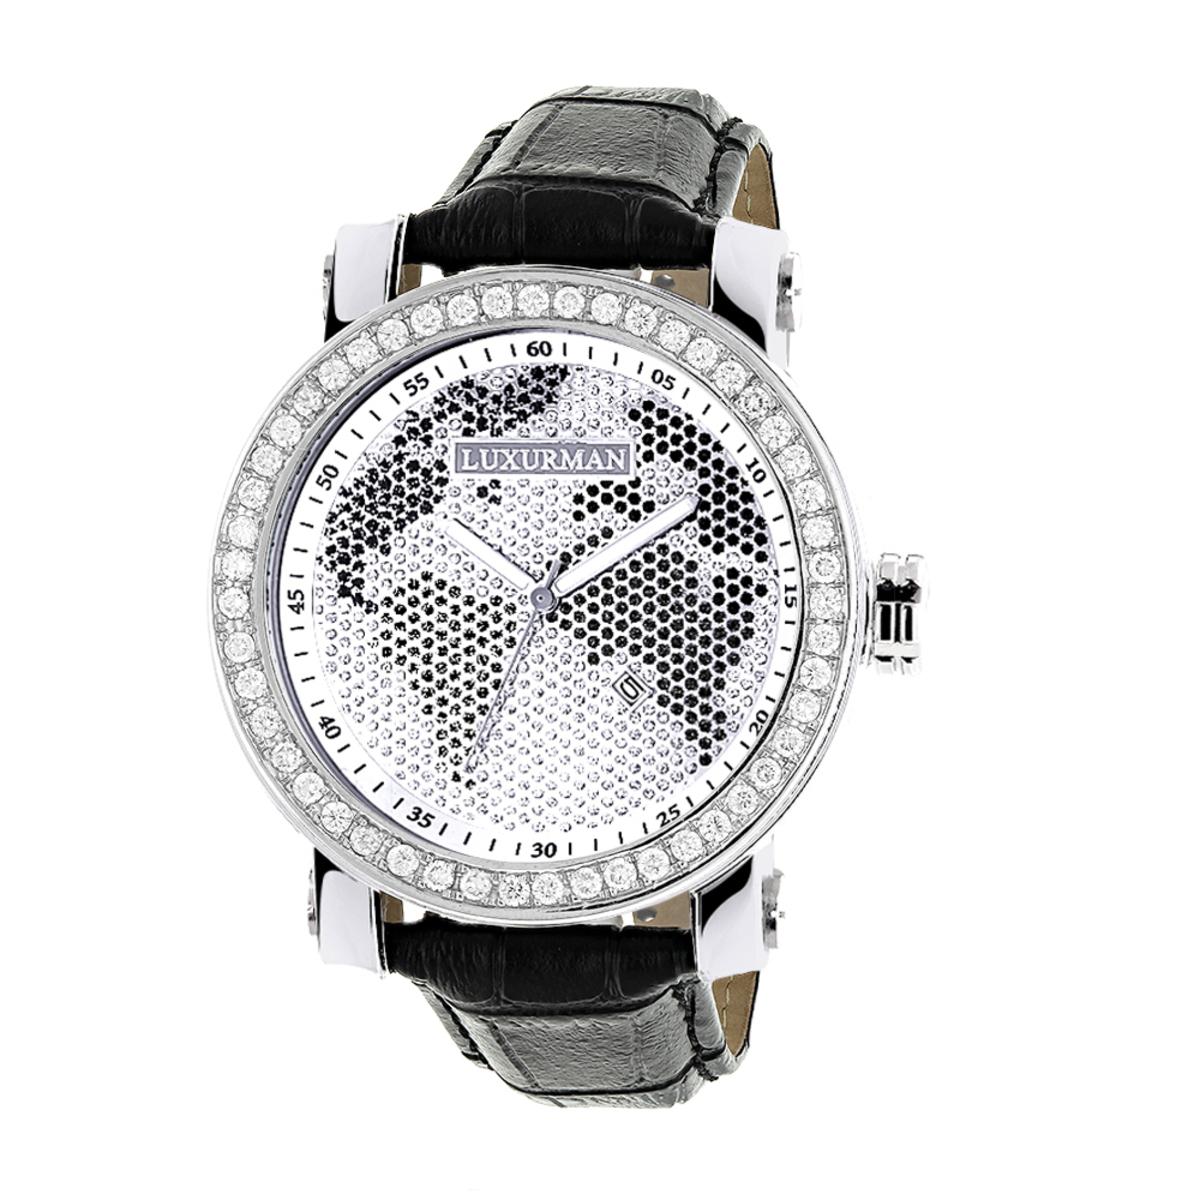 Luxurman Black & White Worldface VS Diamond Watch 4 ct